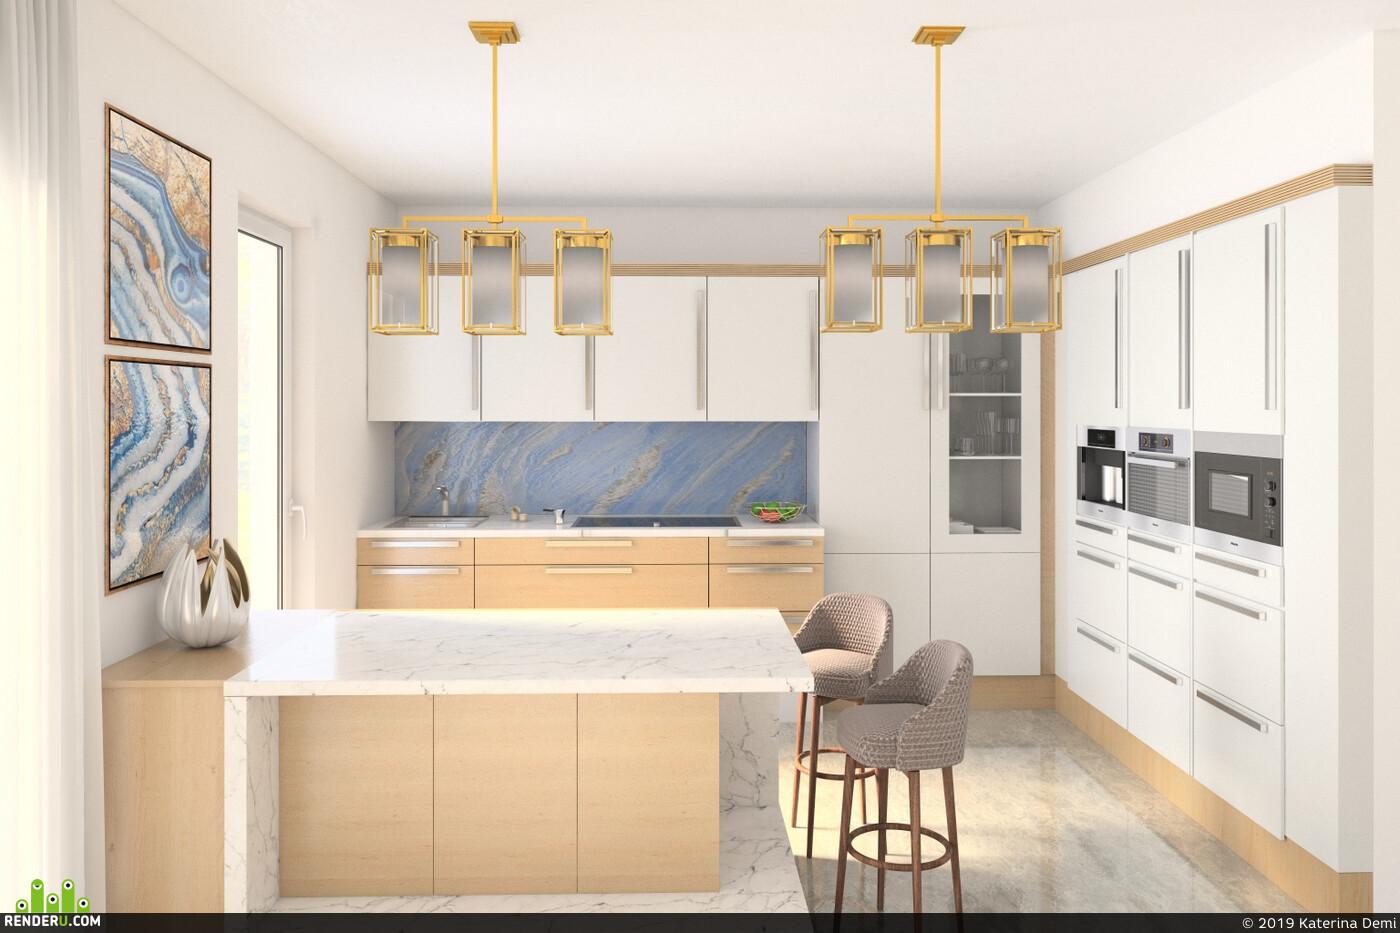 кухня, интерьер, дизайн интерьера, interior interior design design 3D 3D Studio Max 3D архитектура интерьер дизайн интерьера интерьер, visualization, 3д визуализация интерьера, Интерьерная визуализация, визуализация интерьера, гостиная, 3d, 3ds Max